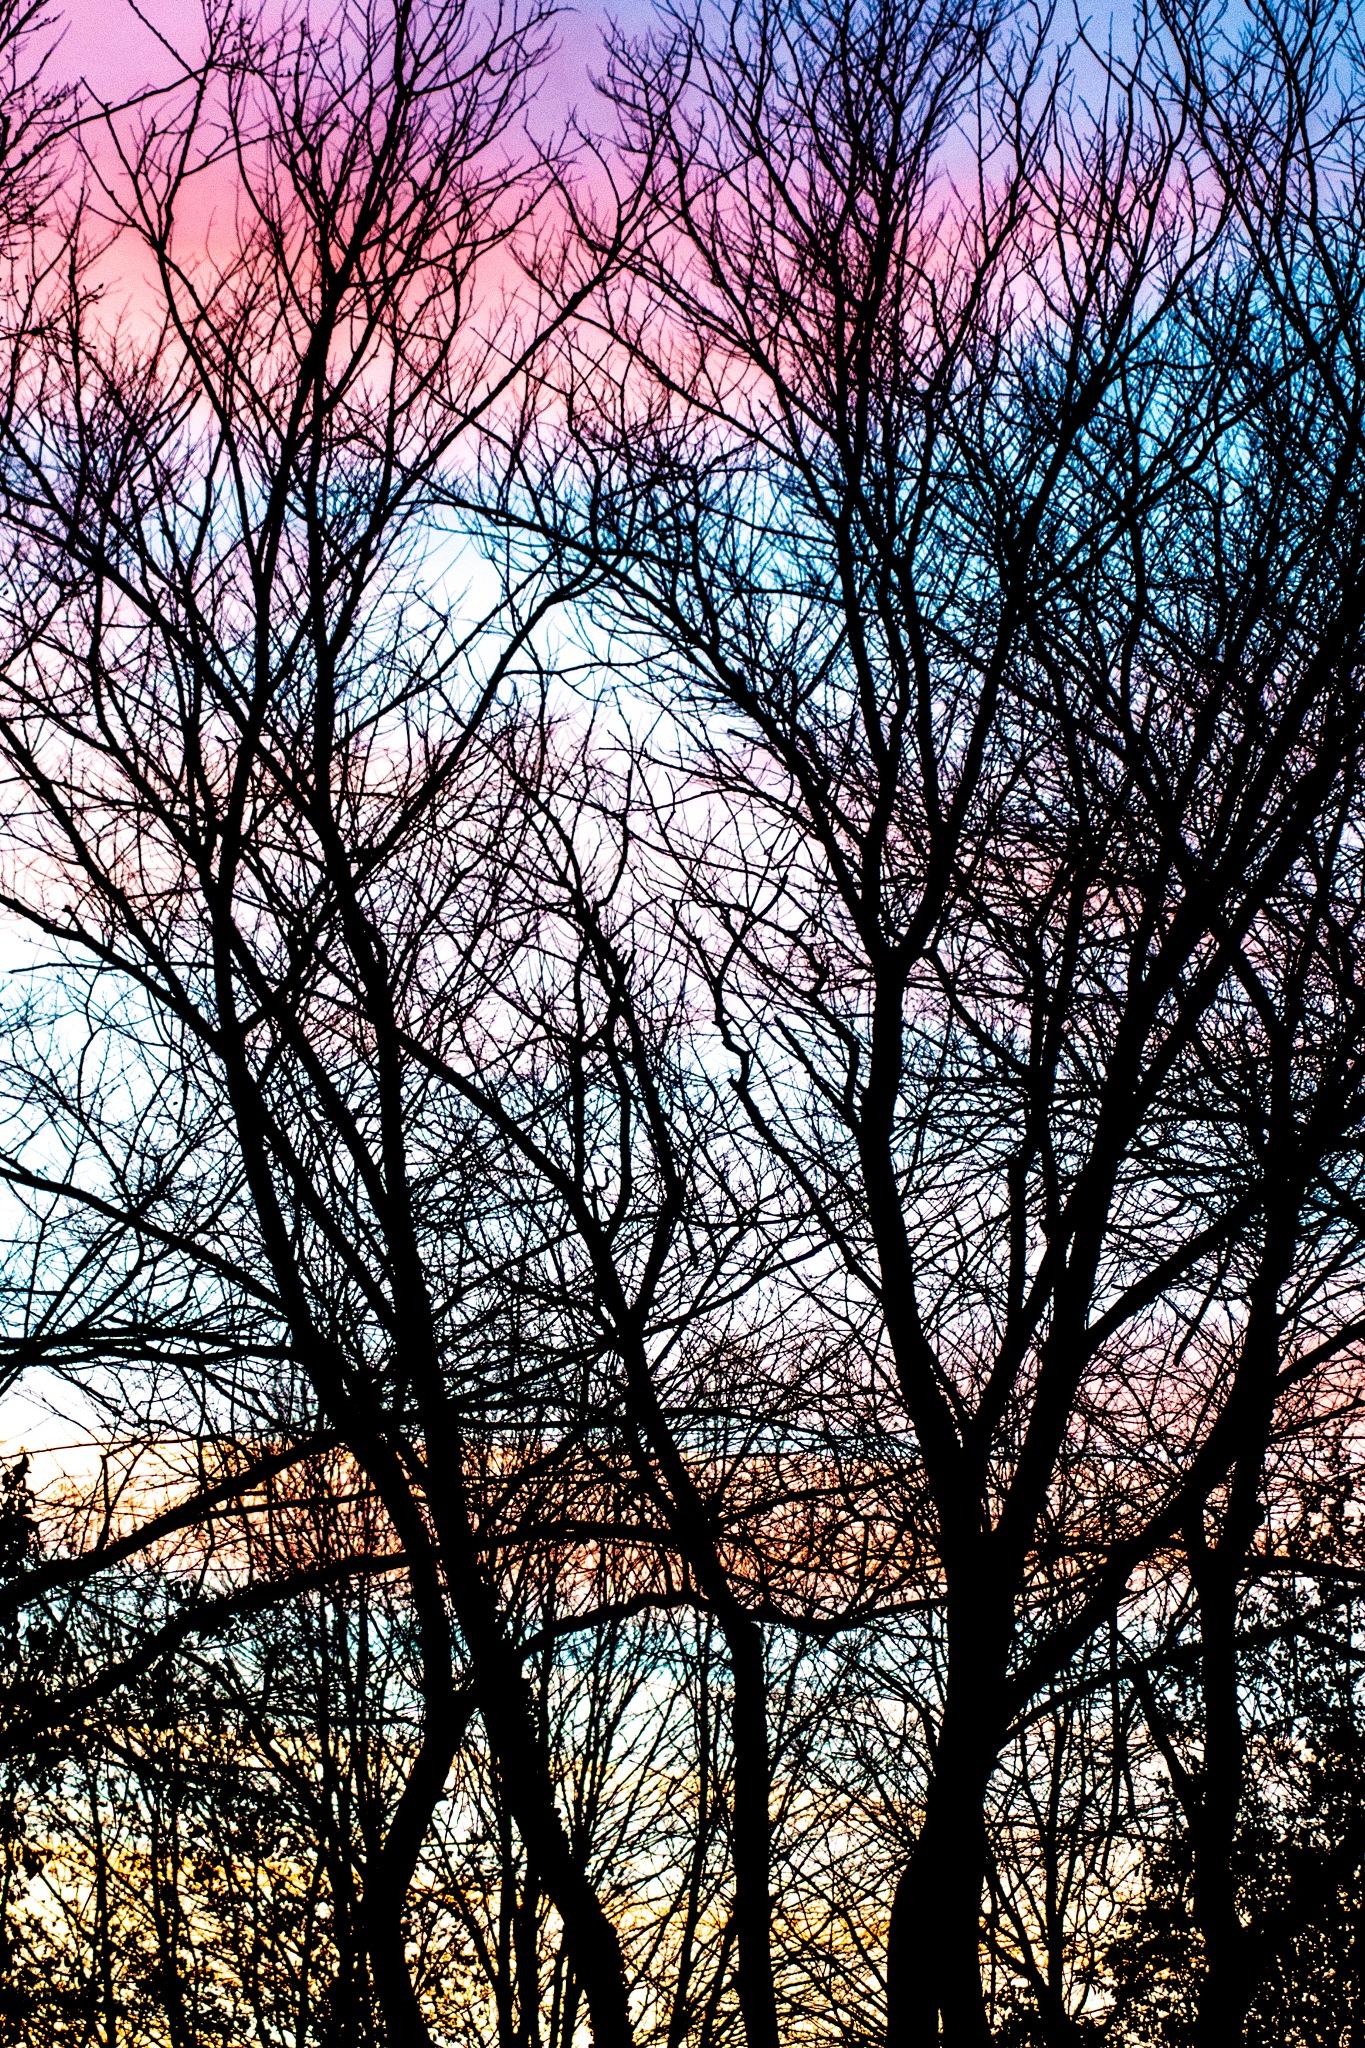 Sunset by Frank Brande